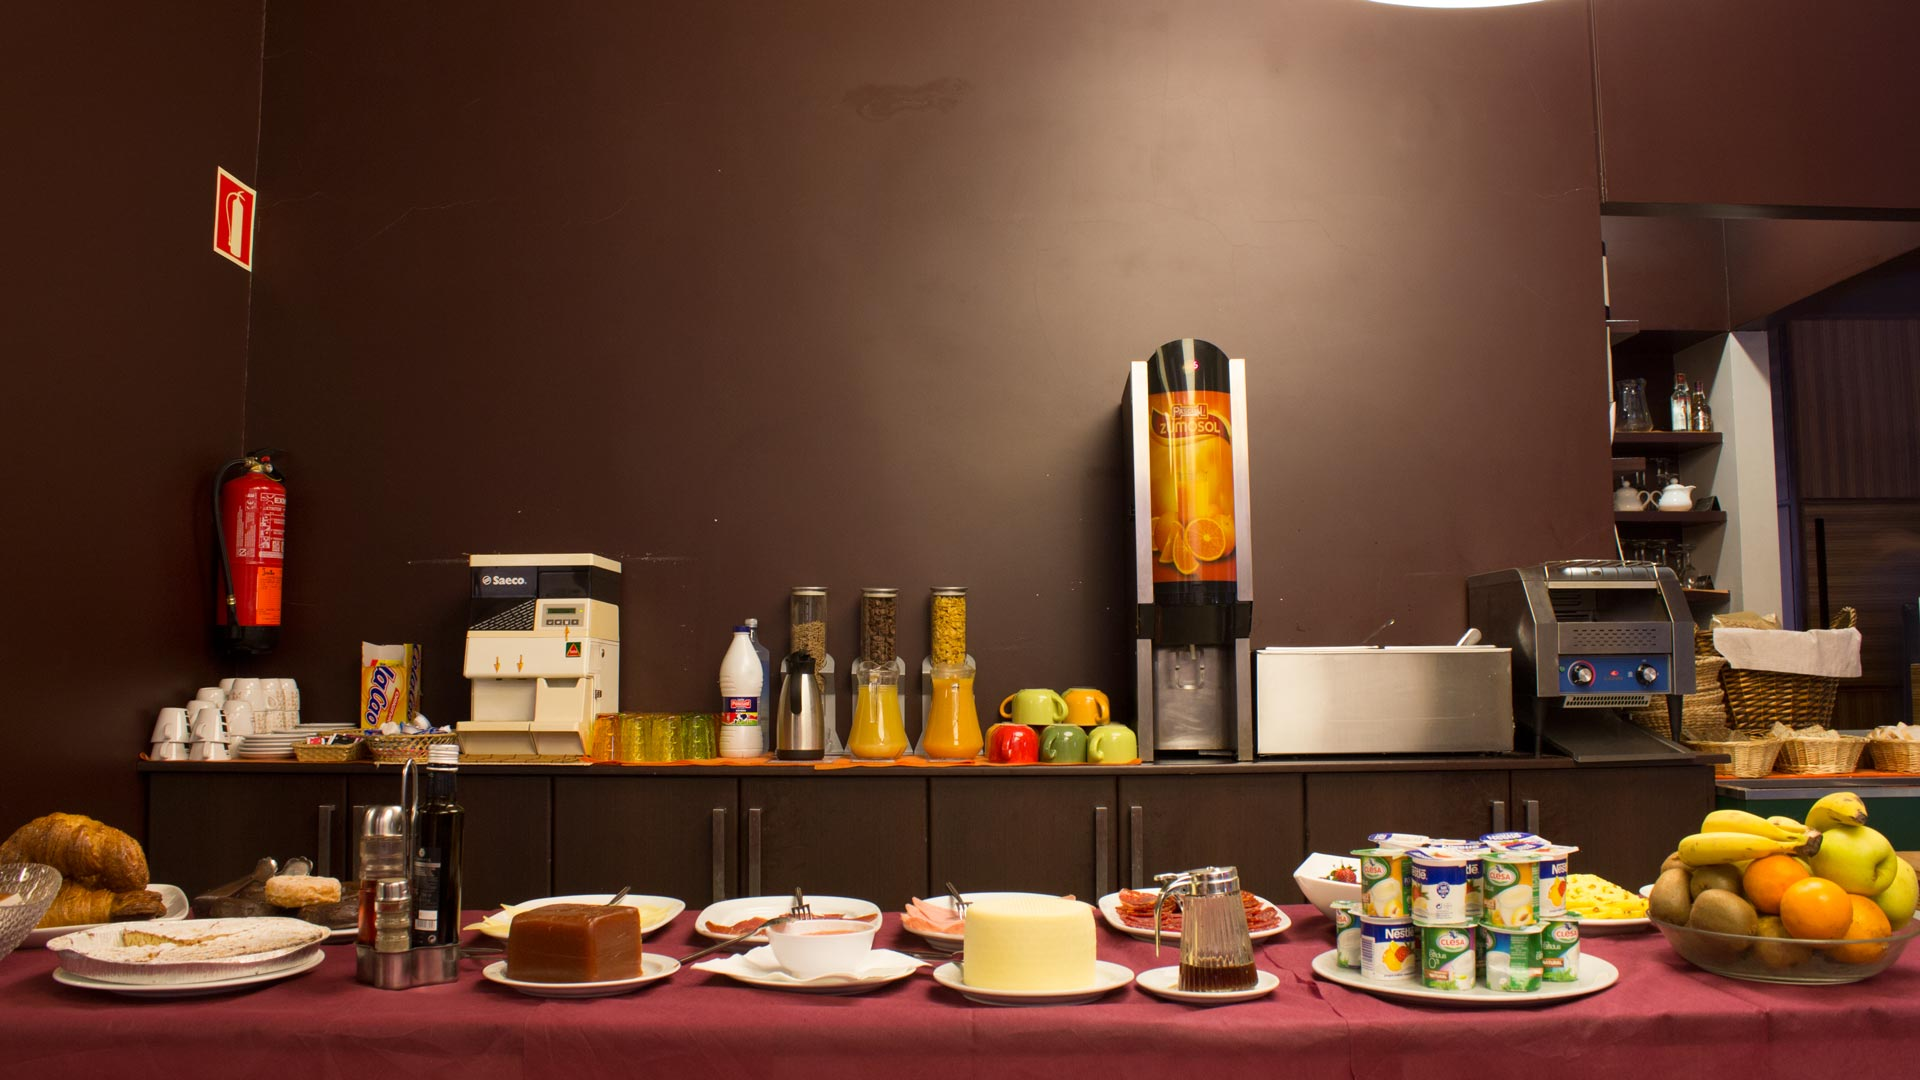 dpcristal-restaurante-albergue-slider1